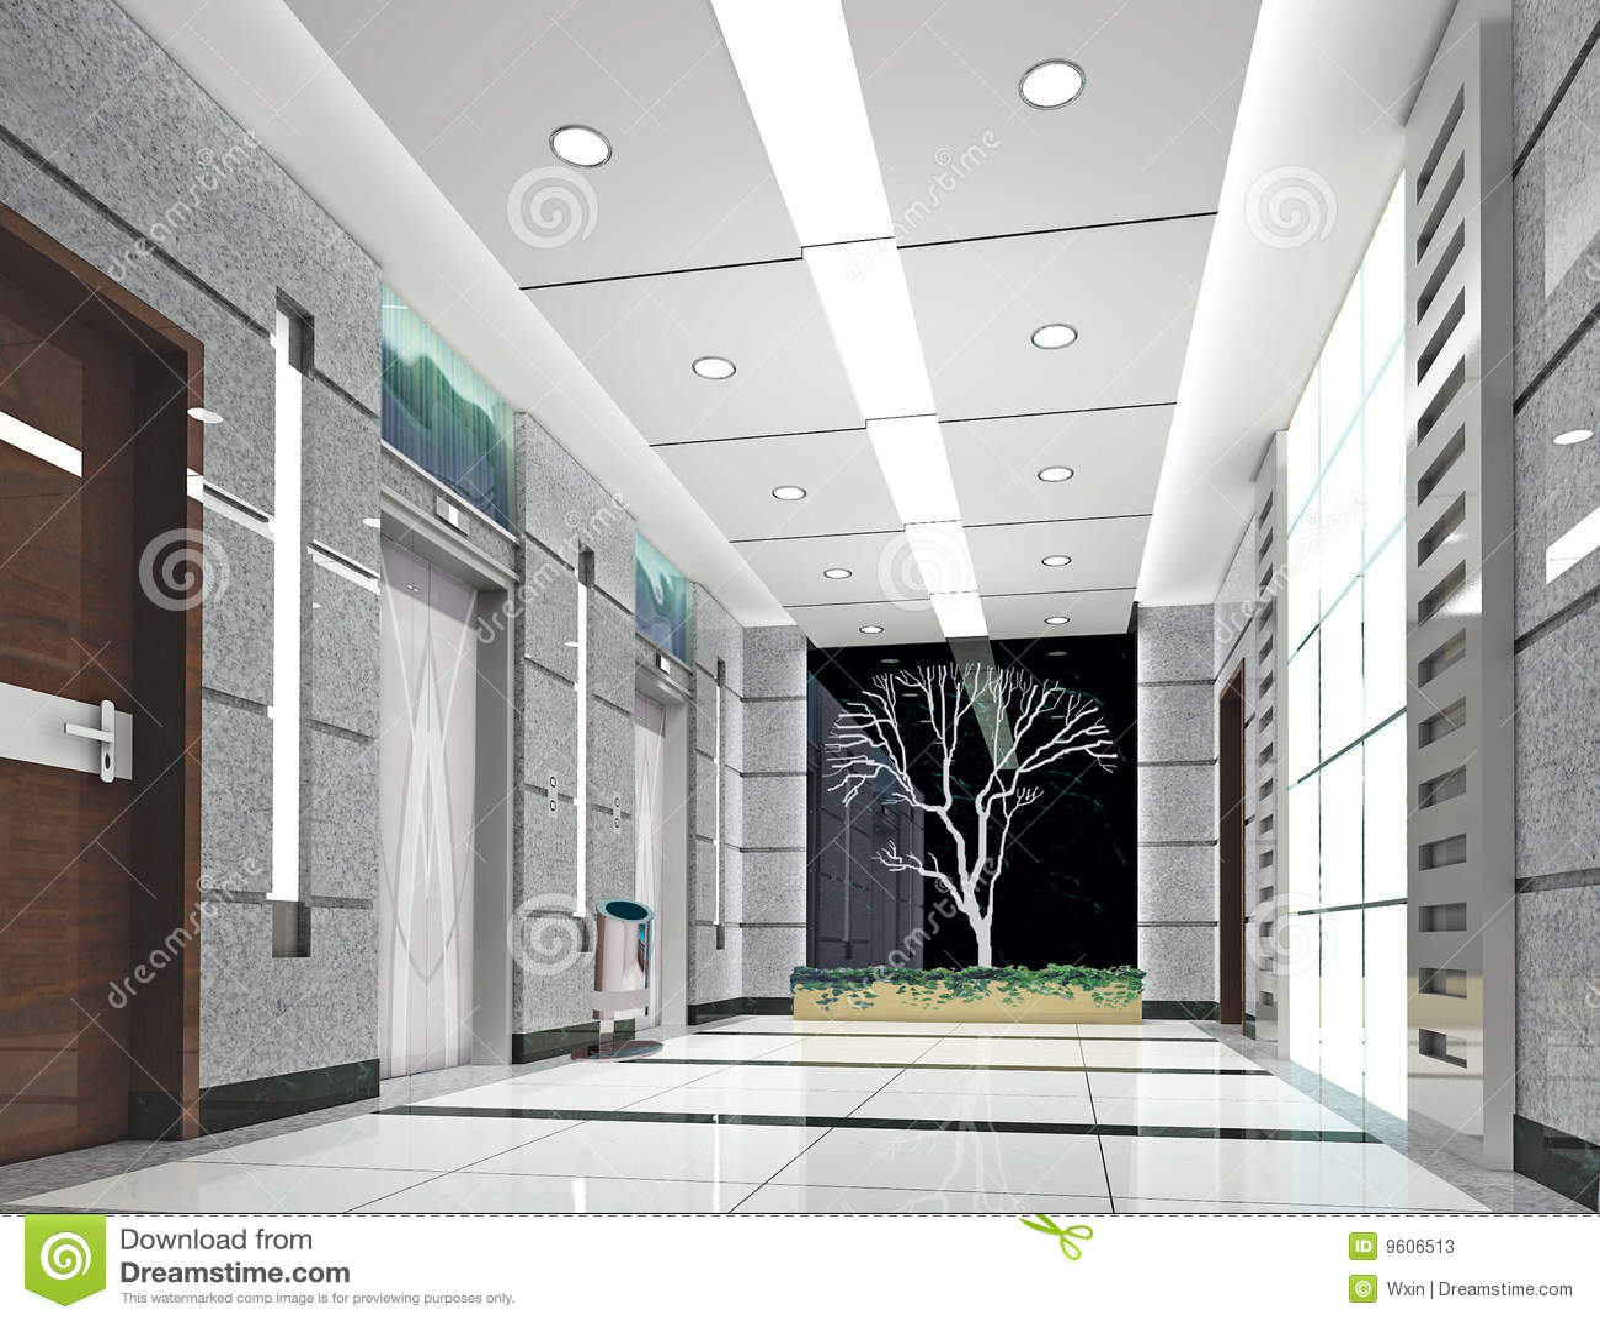 Stock Photos 3d Elevator Lobby Rendering Image9606513 on El Lobby Floor Plan Design